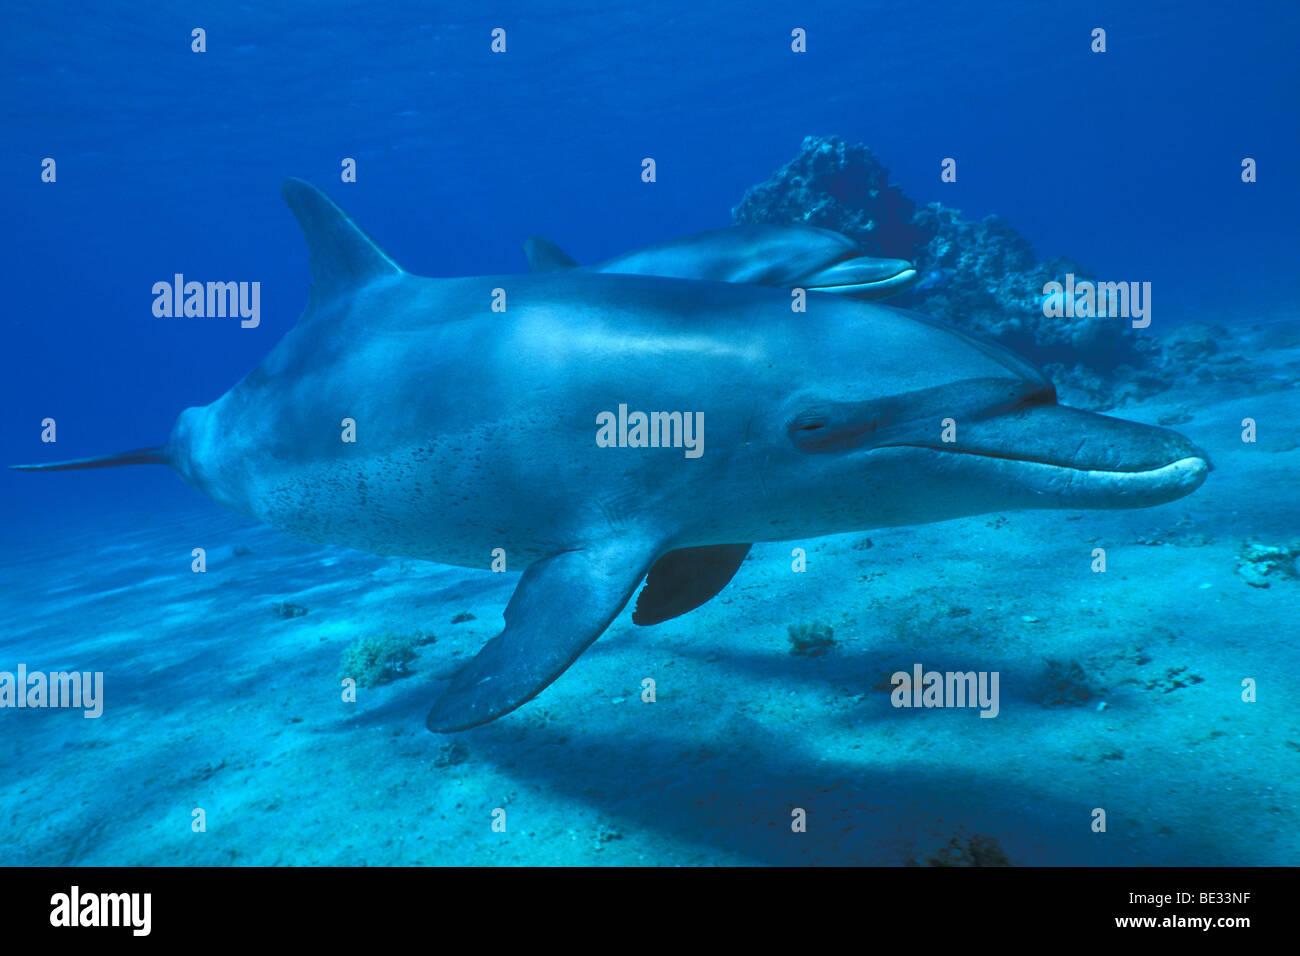 Bottlenose Dolphins, Tursiops truncatus, Nuweiba, Sinai, Red Sea, Egypt - Stock Image